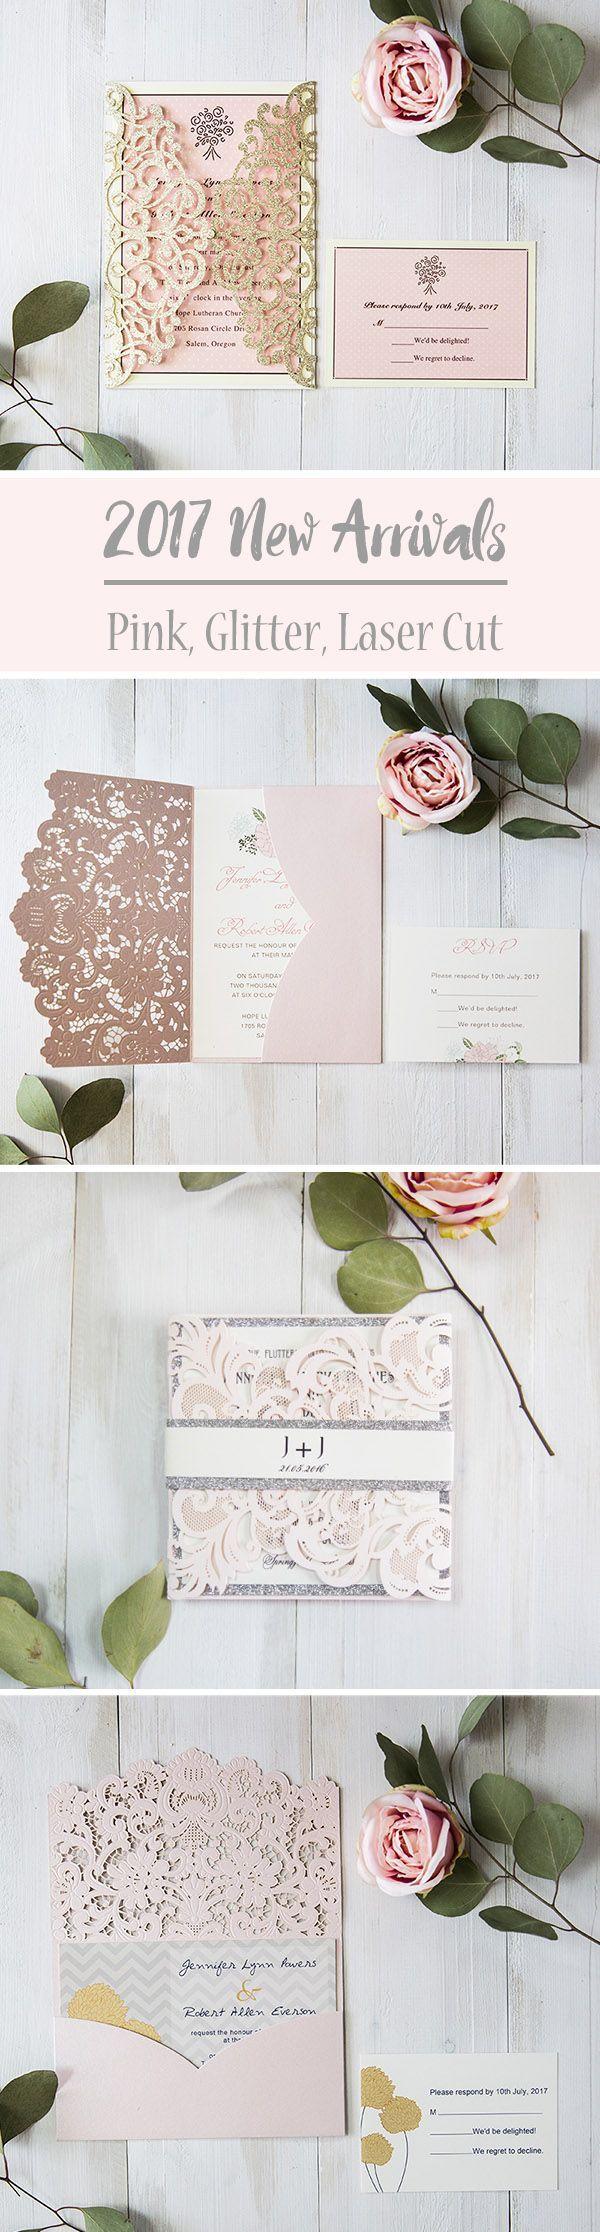 summer wedding invitation wording%0A romantic and elegant pink laser cut wedding invitations